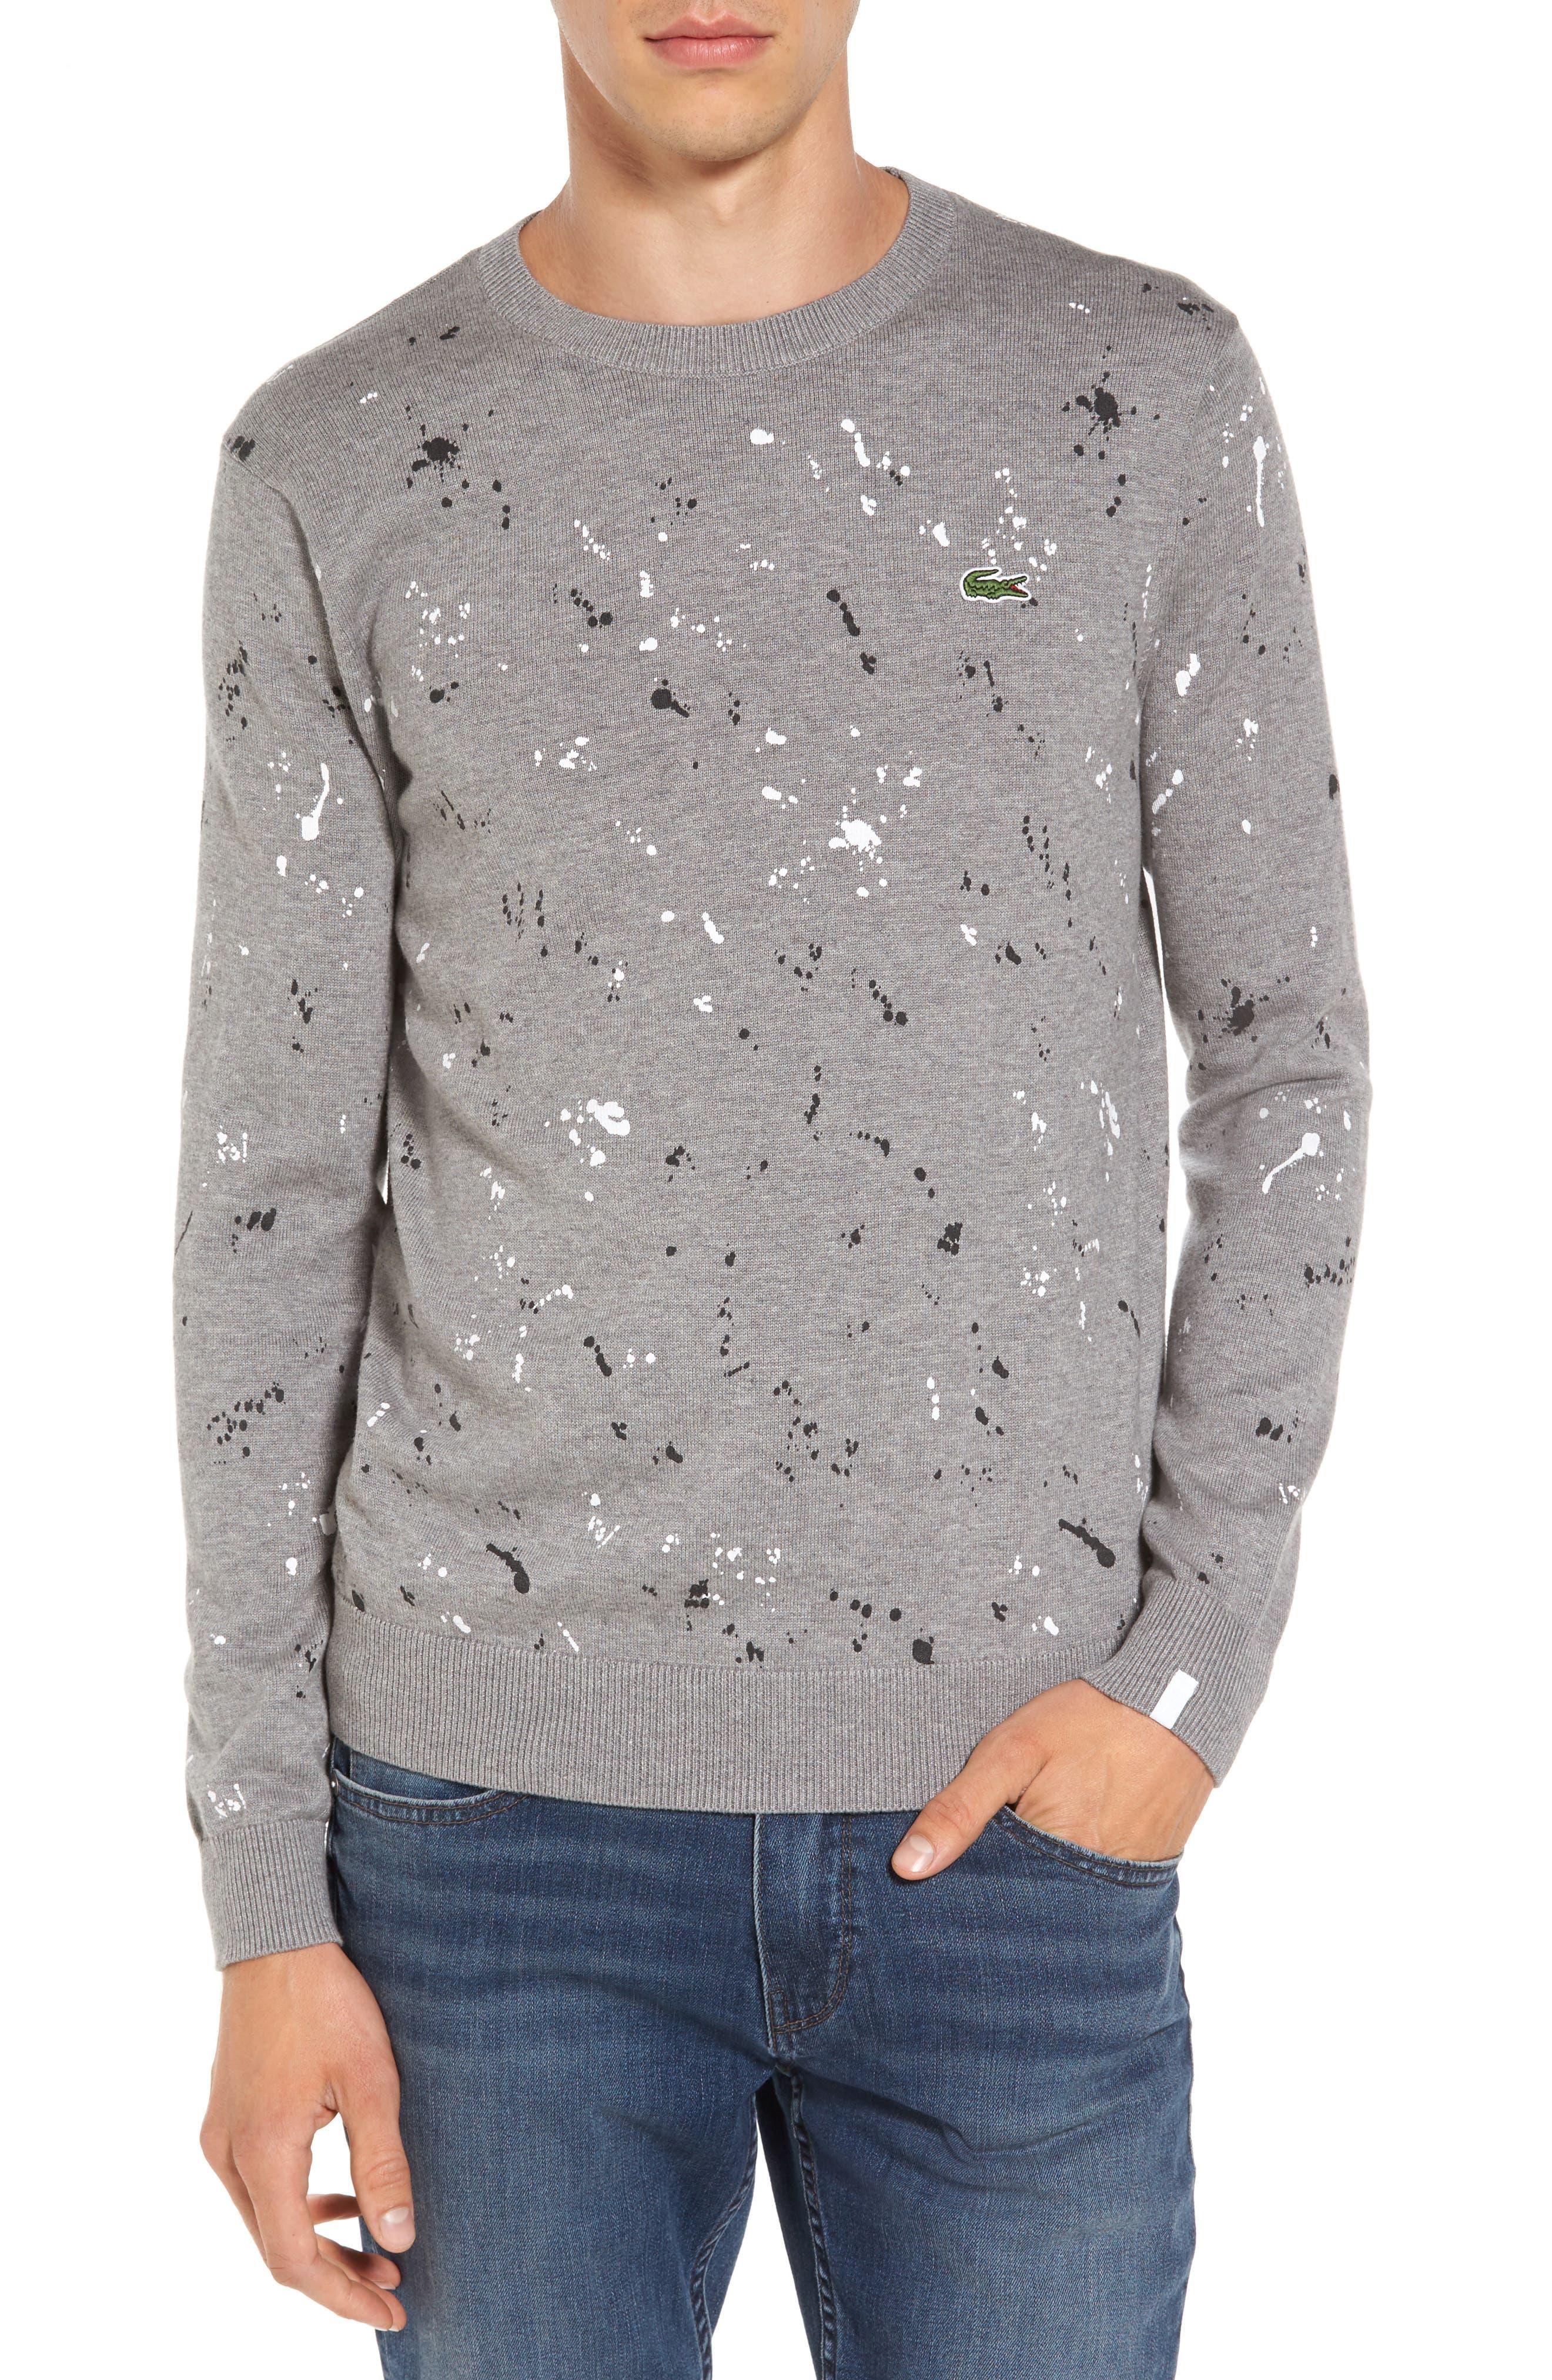 Splatter Sweater,                             Main thumbnail 1, color,                             062